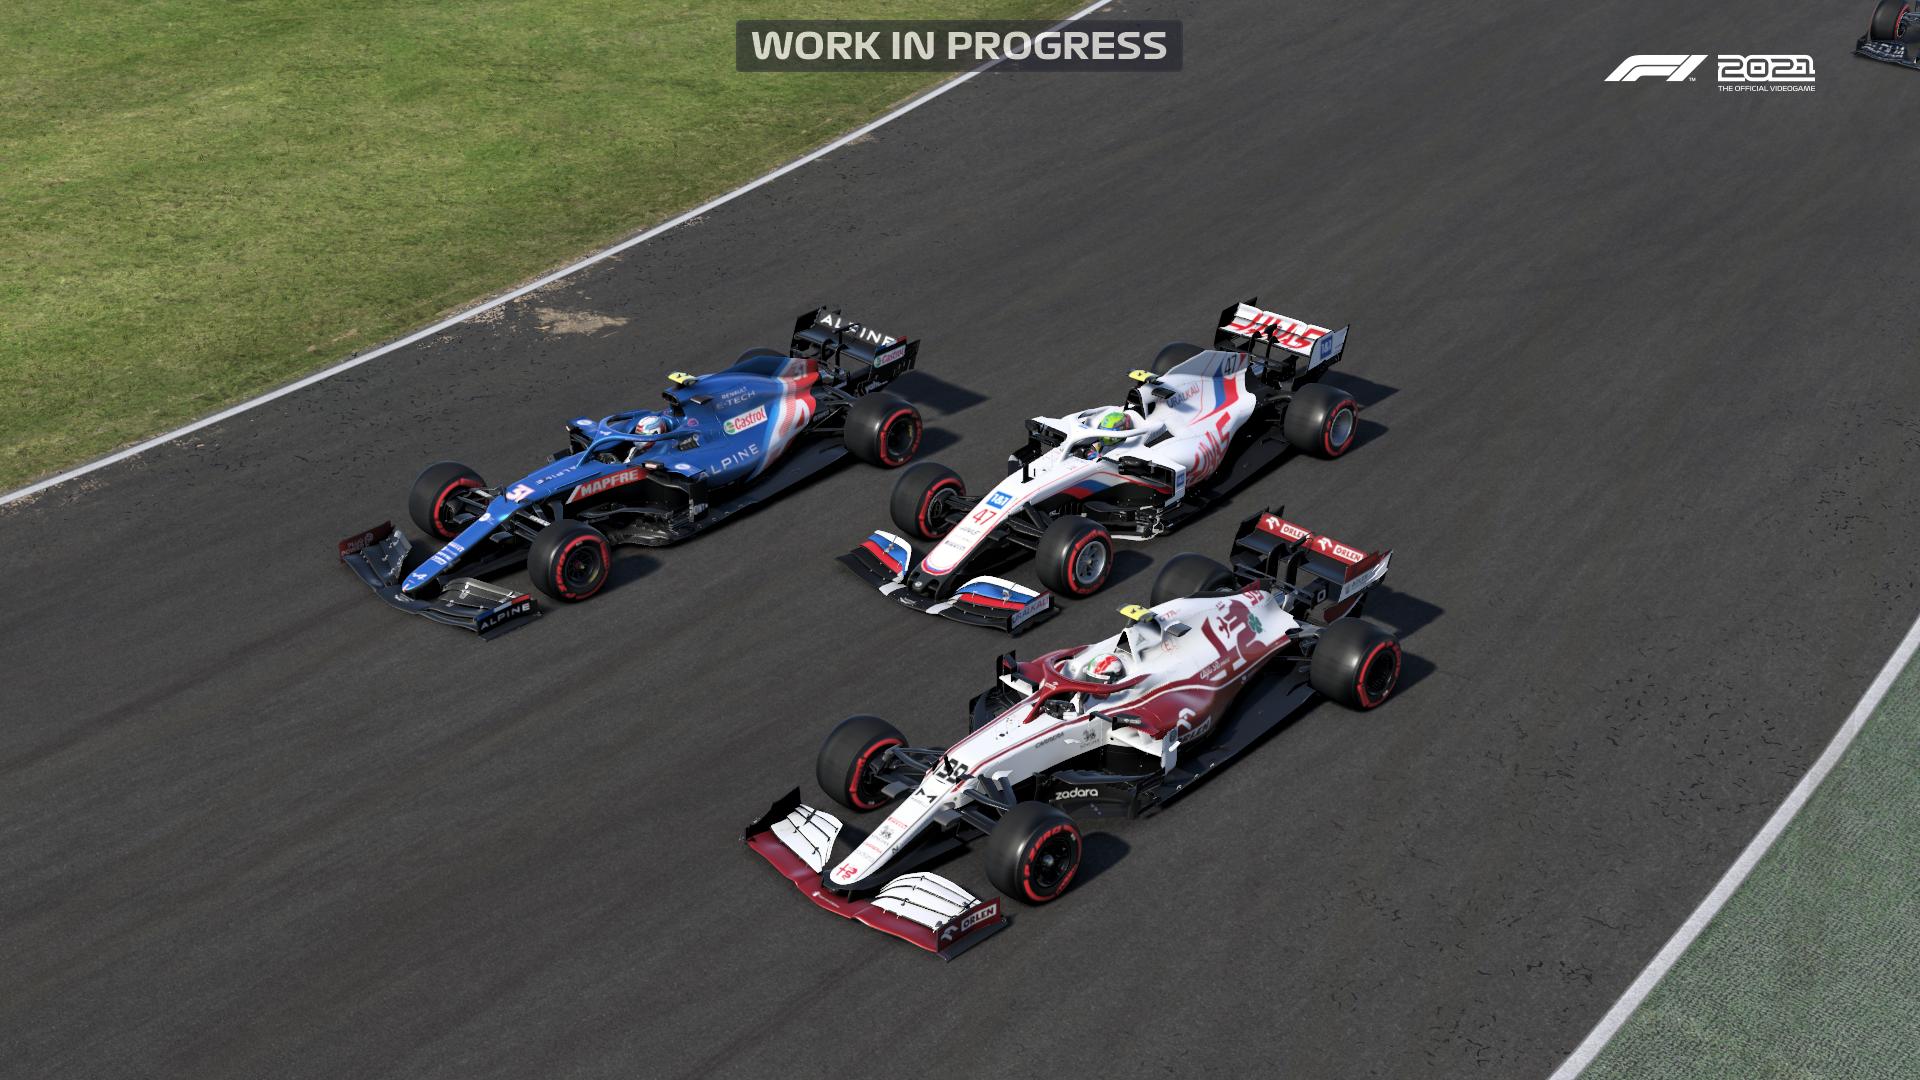 F1 2021 Preview Silverstone Pic 1